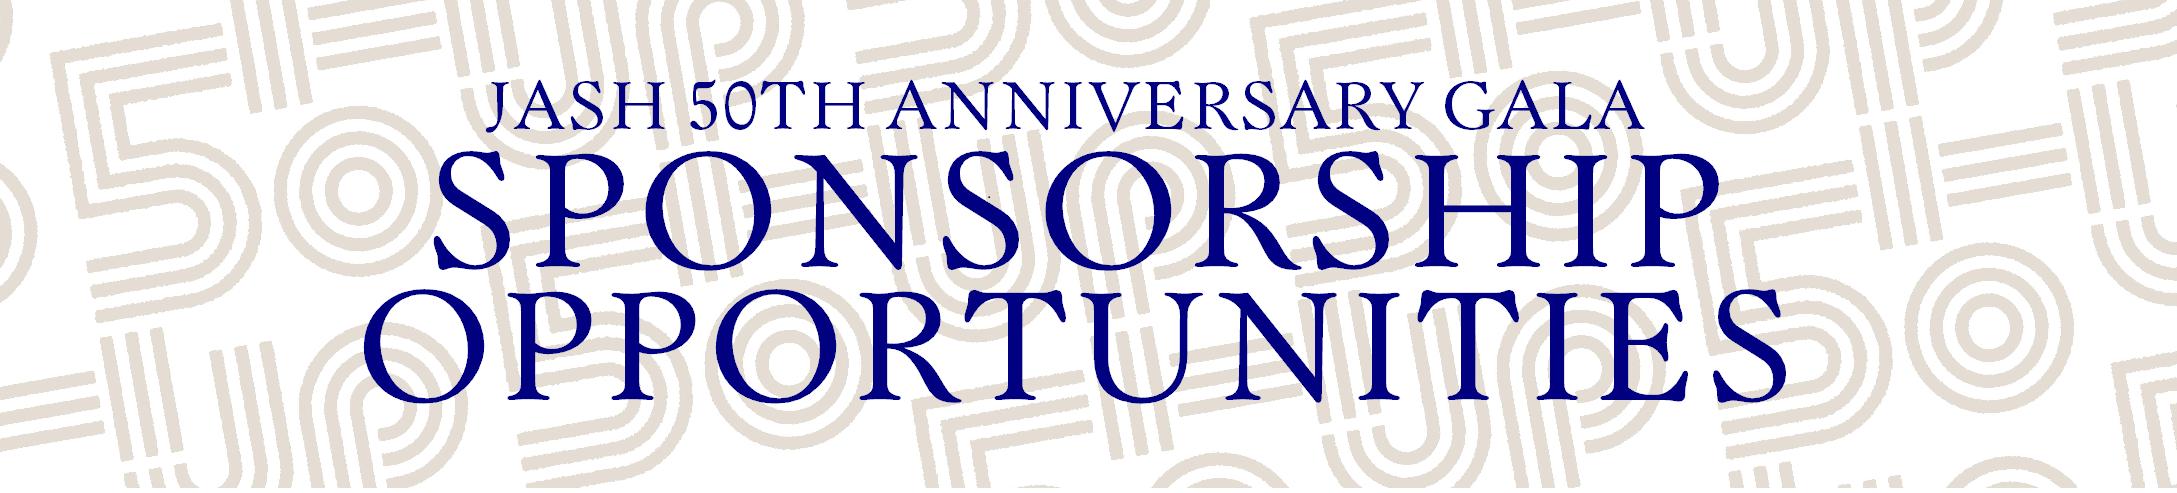 Banner_SponsorshipOpportunities.png